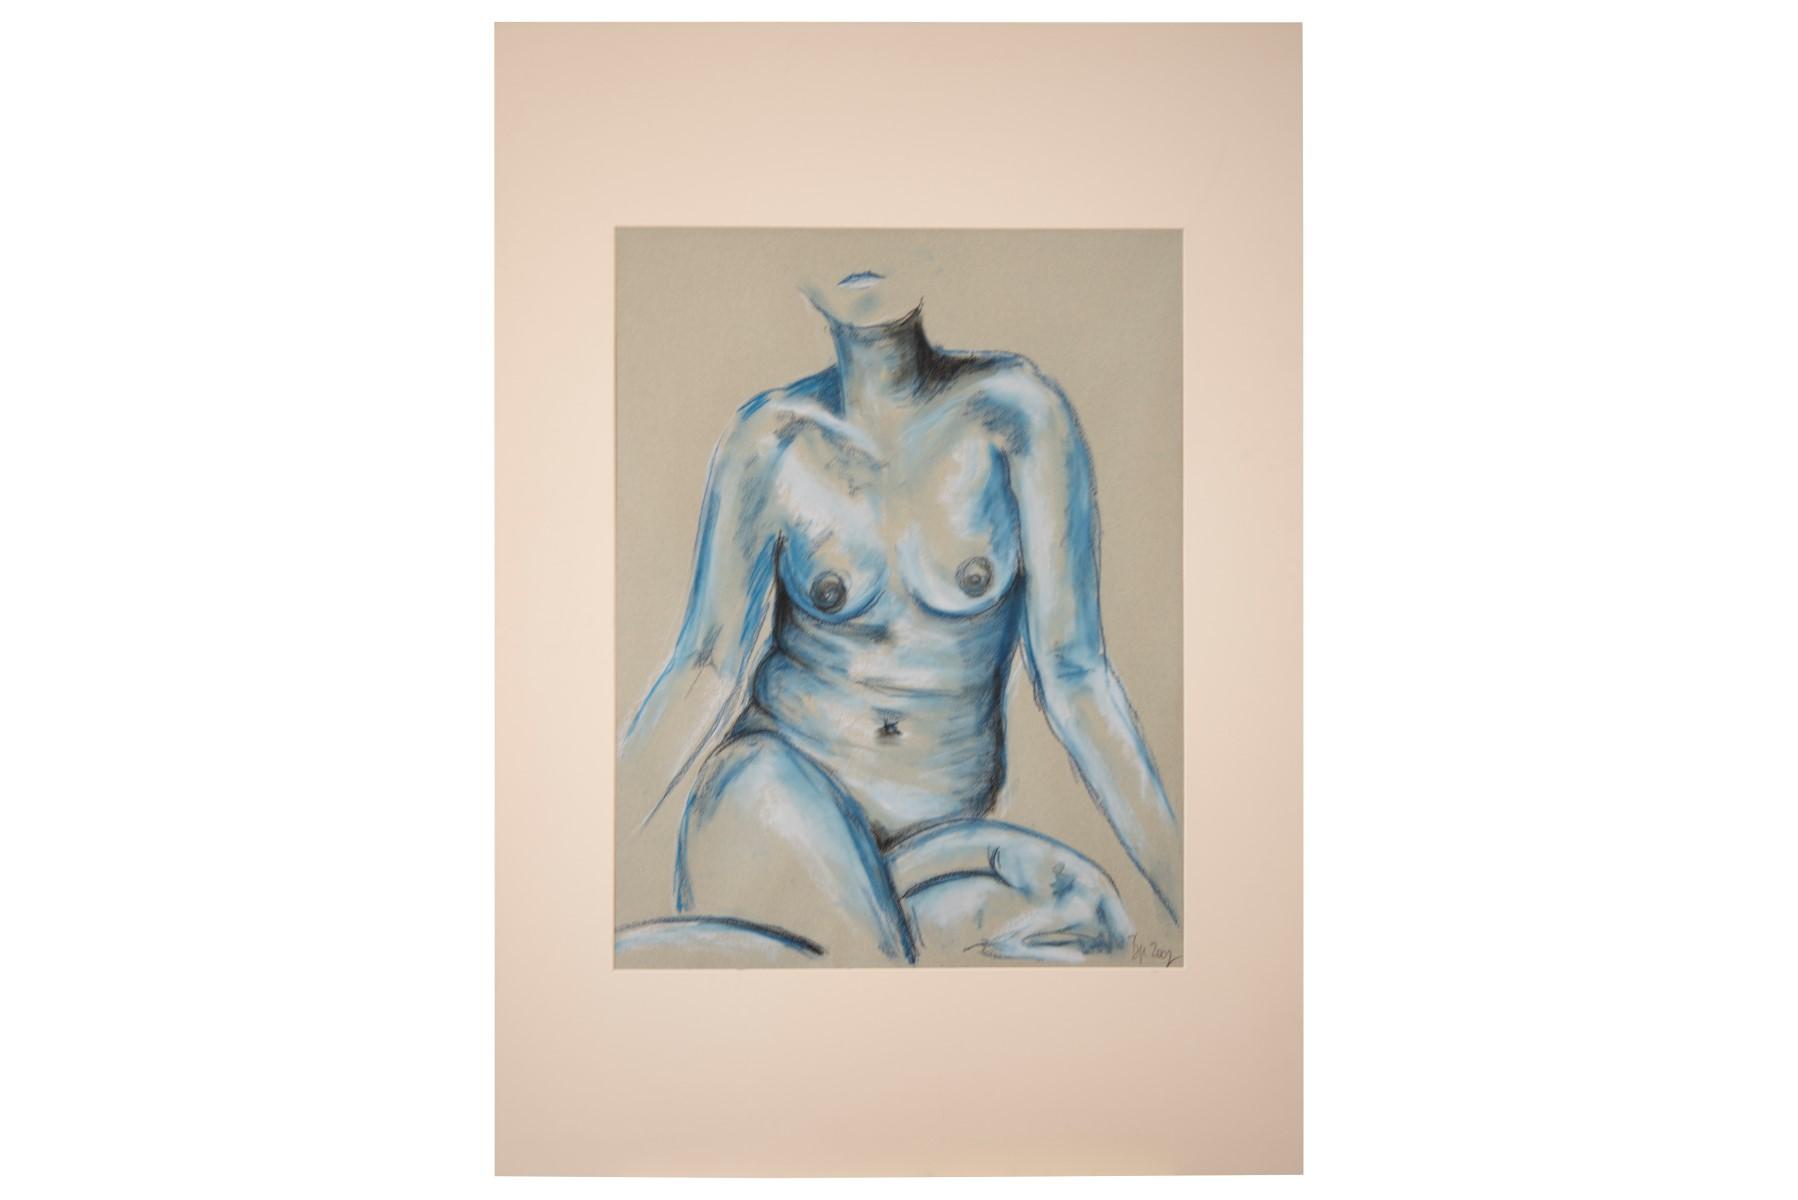 #136 Pauline Buchinger, Nude Sitting Blue | Pauline Buchinger, Aktbild sitzend Blau Image